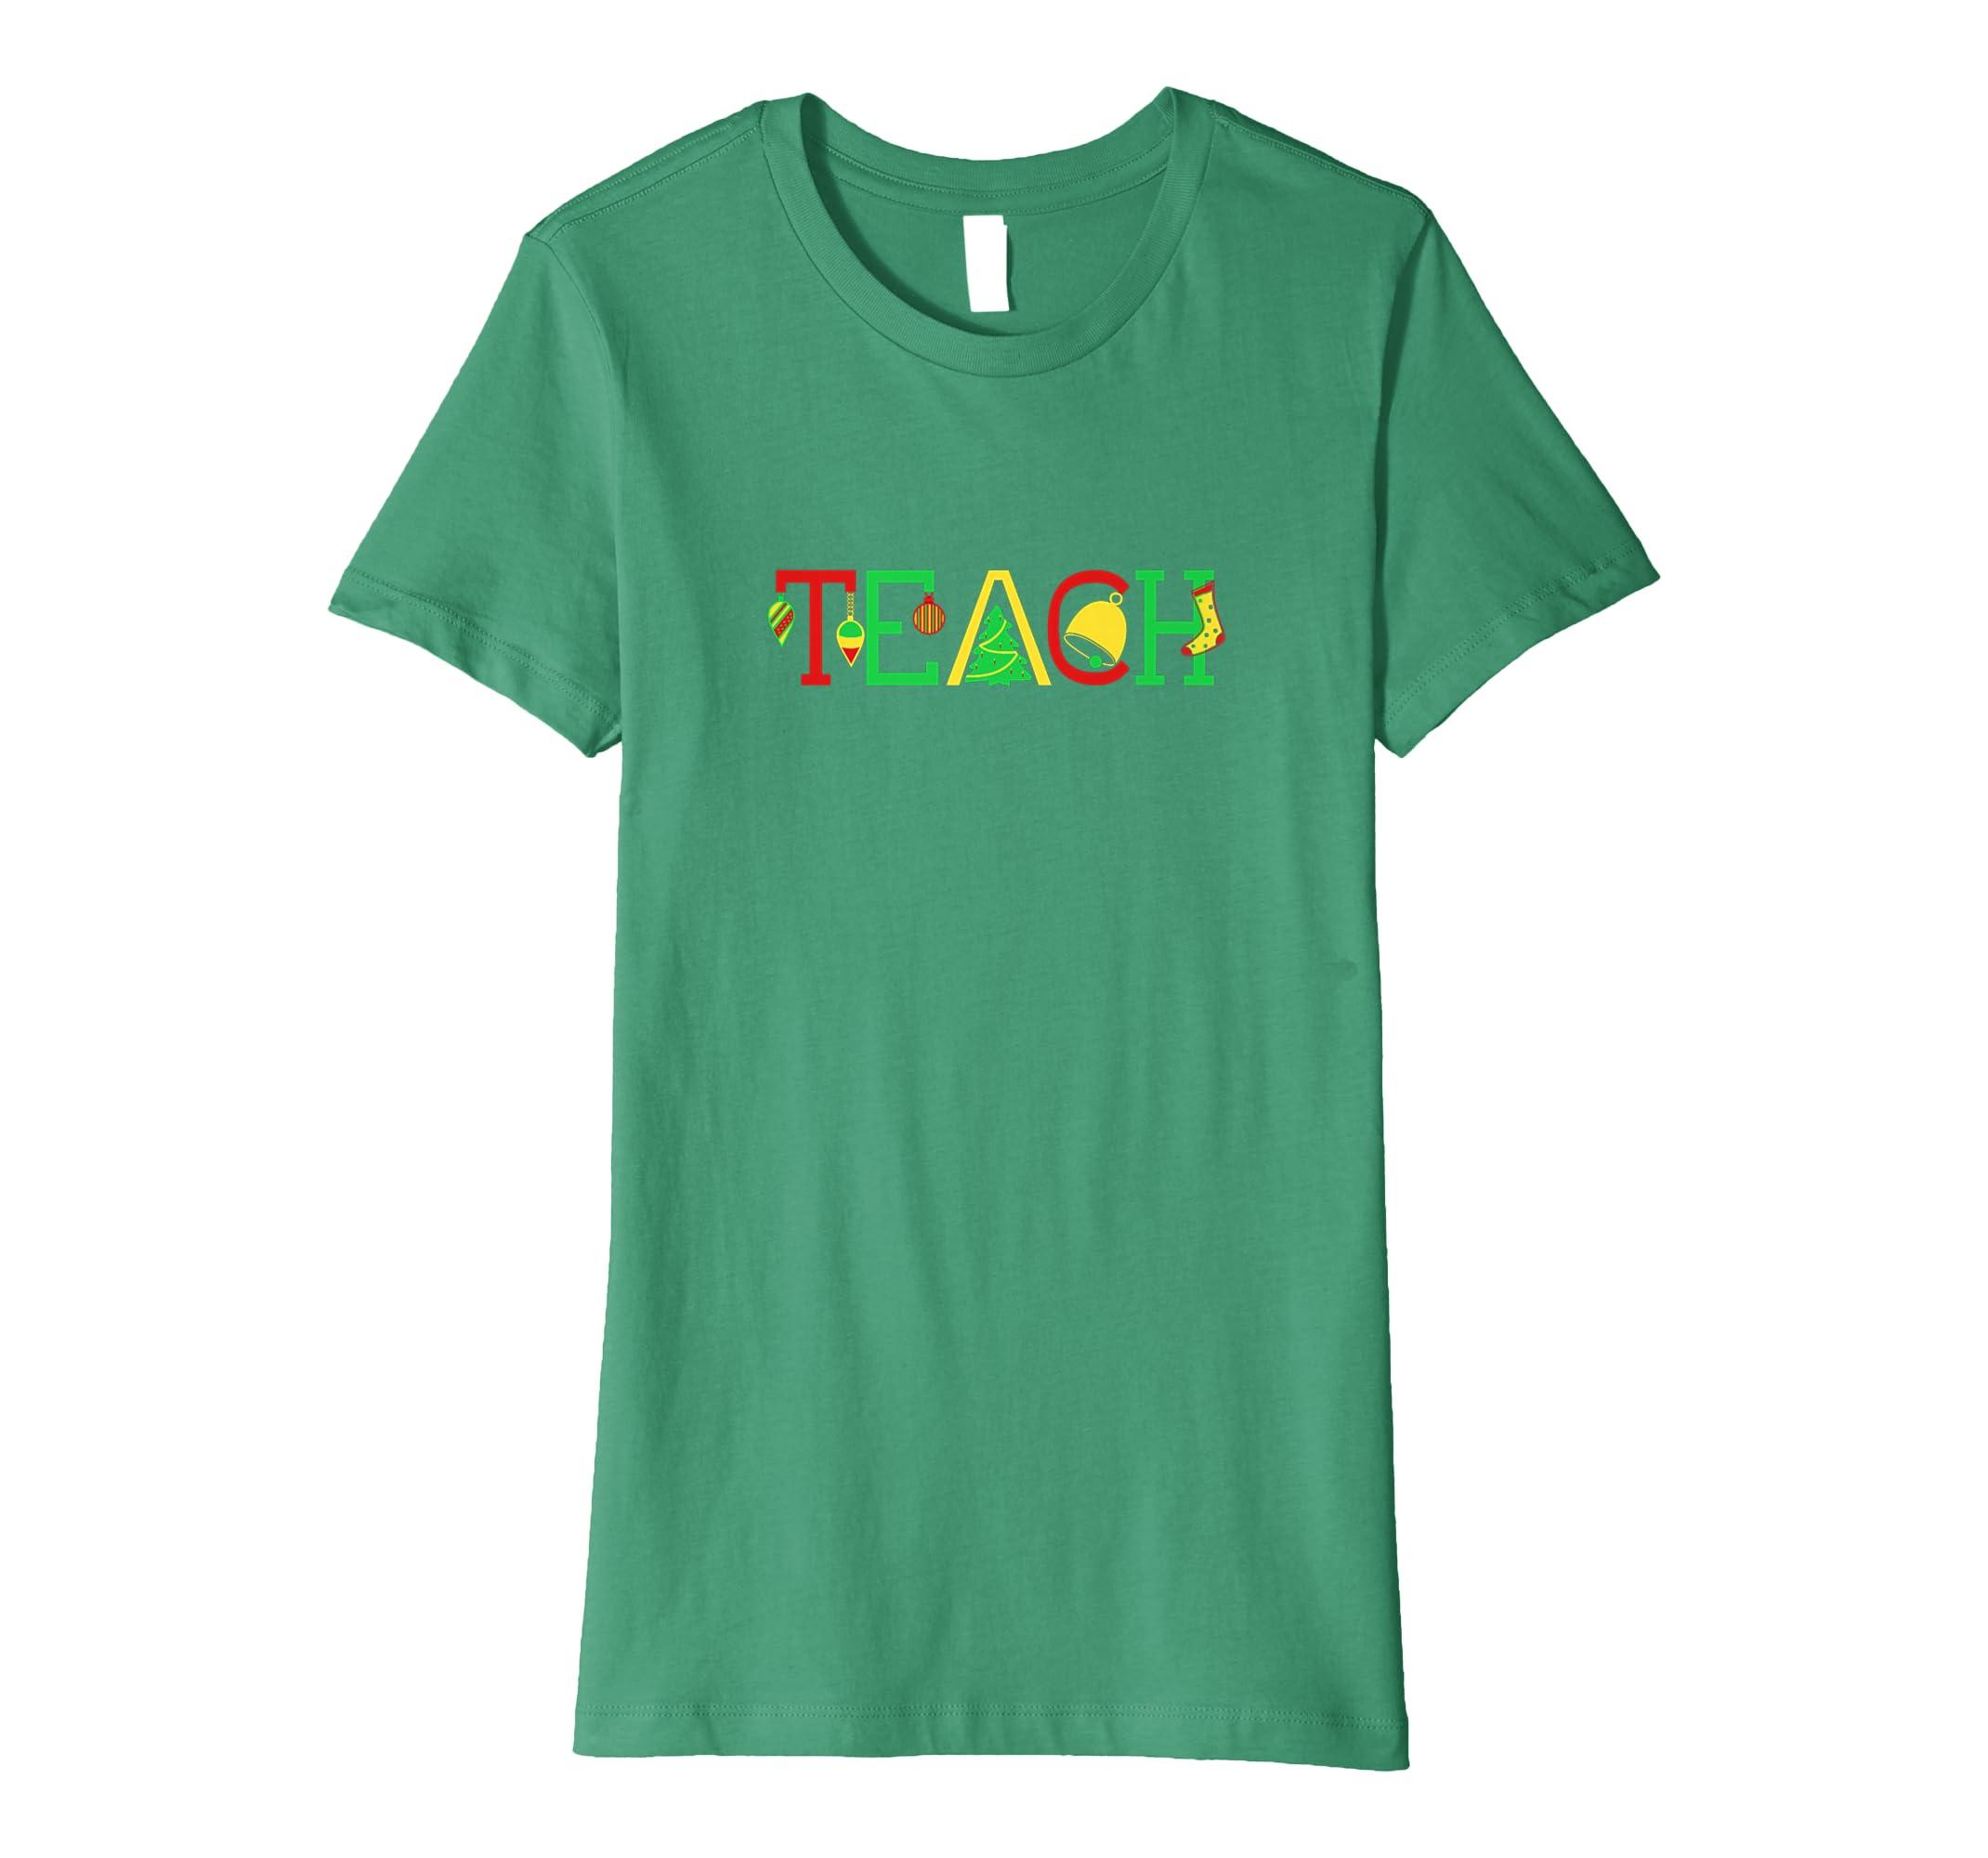 Amazon Teach T shirt Funny Christmas Teacher Teaching Fun Xmas